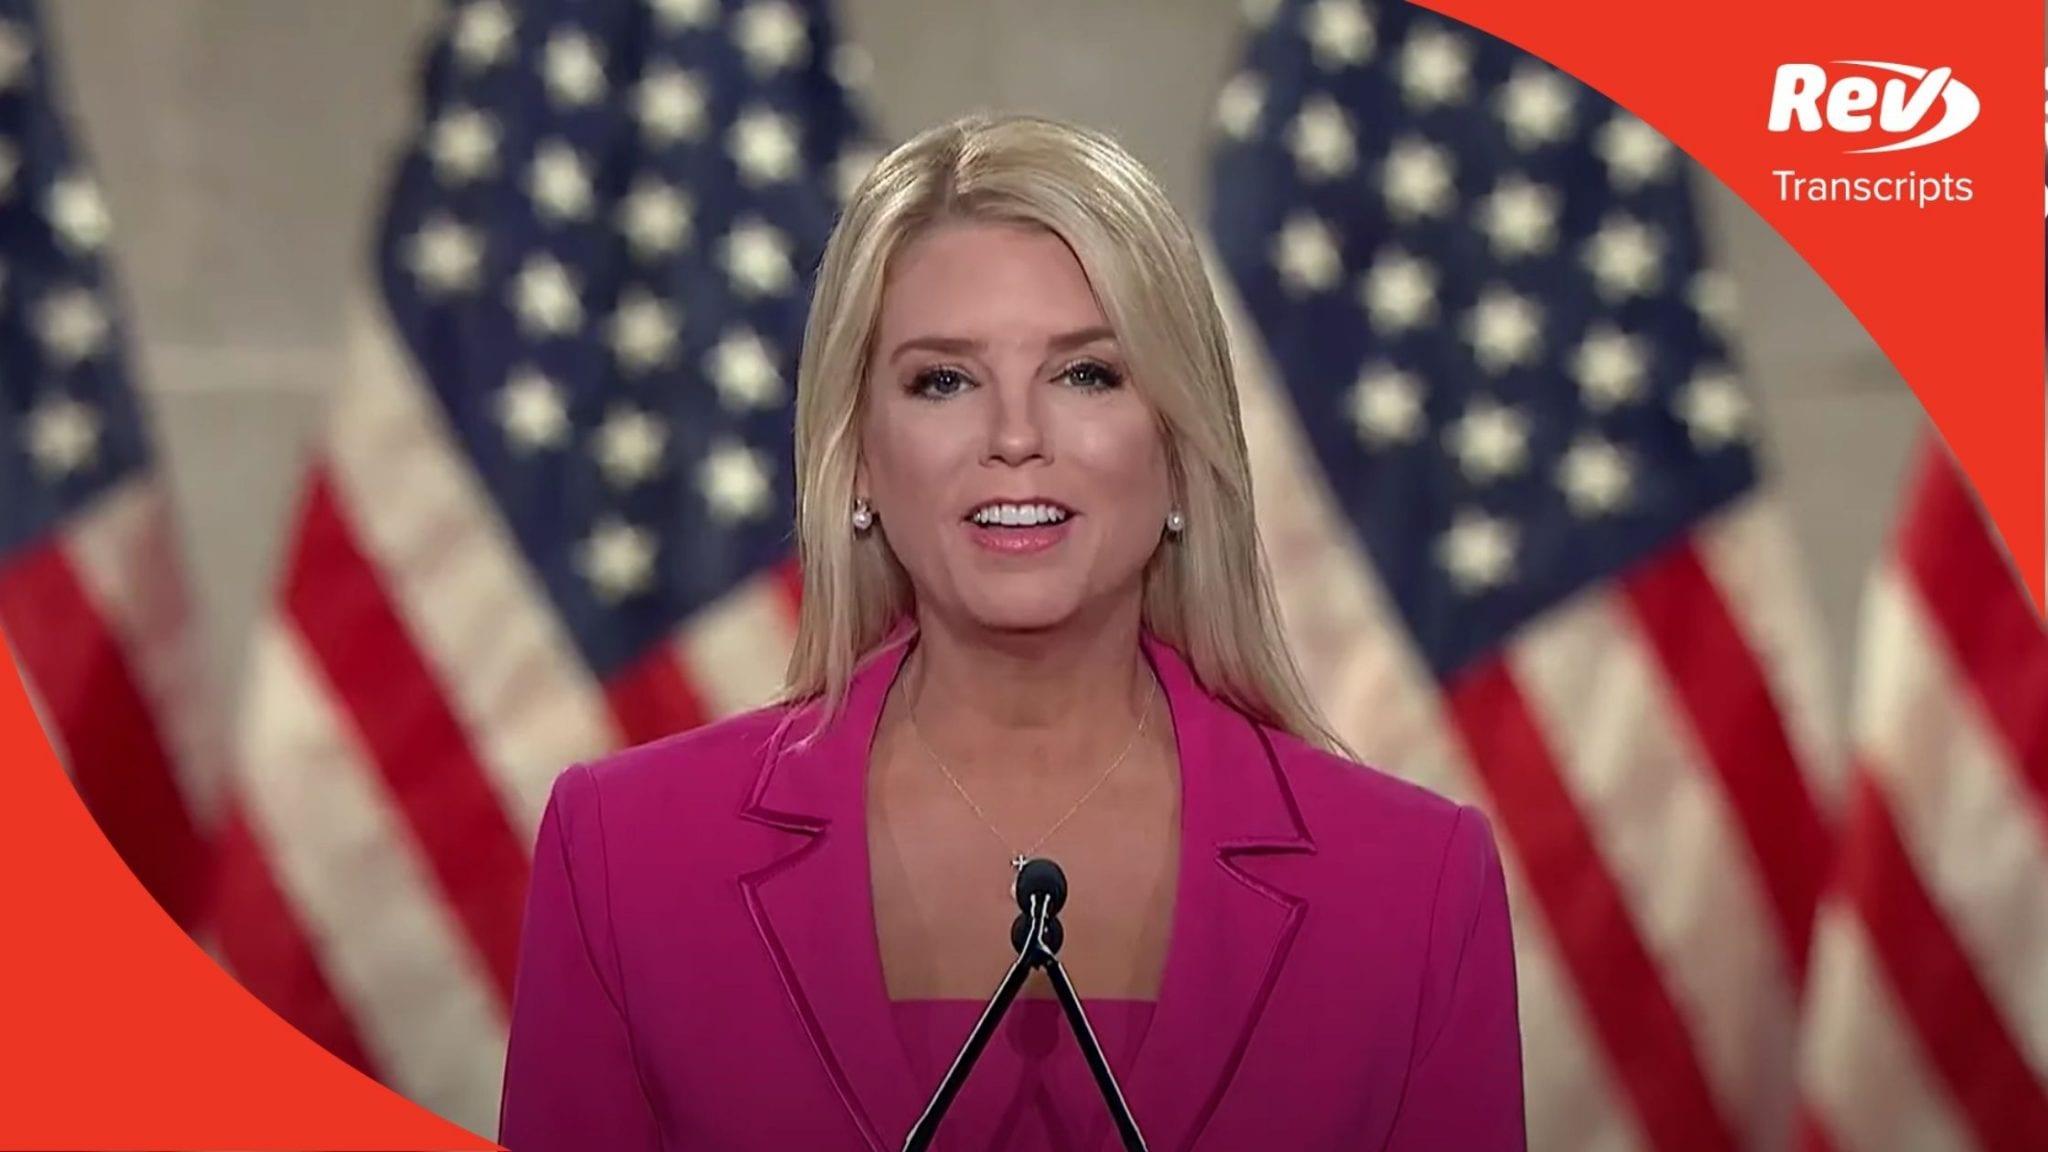 Pam Bondi 2020 RNC Speech Transcript